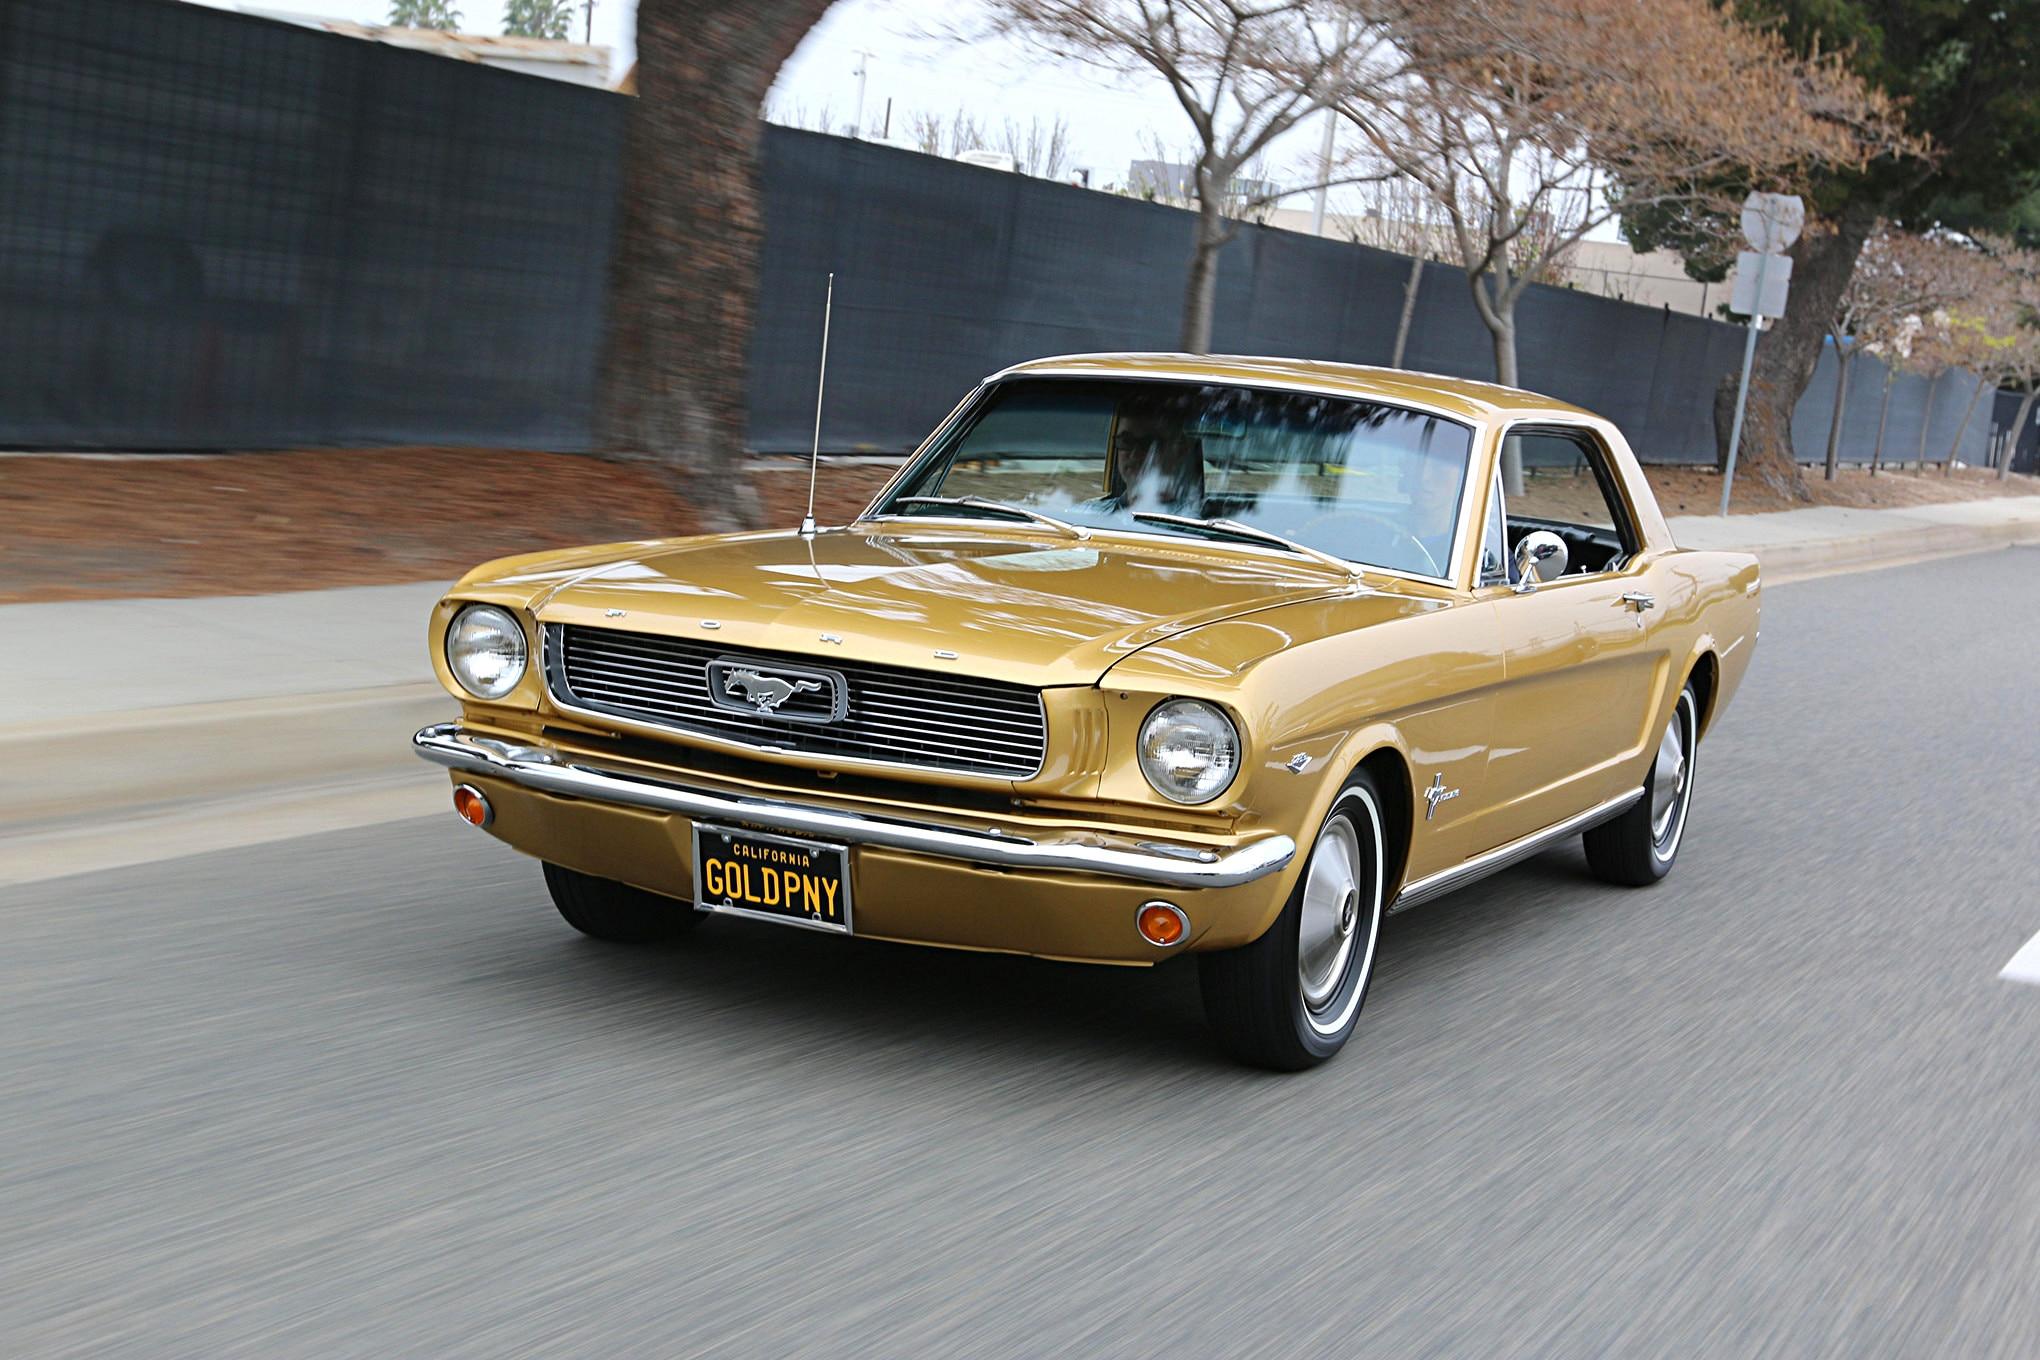 Golden Anniversary Mustang 020